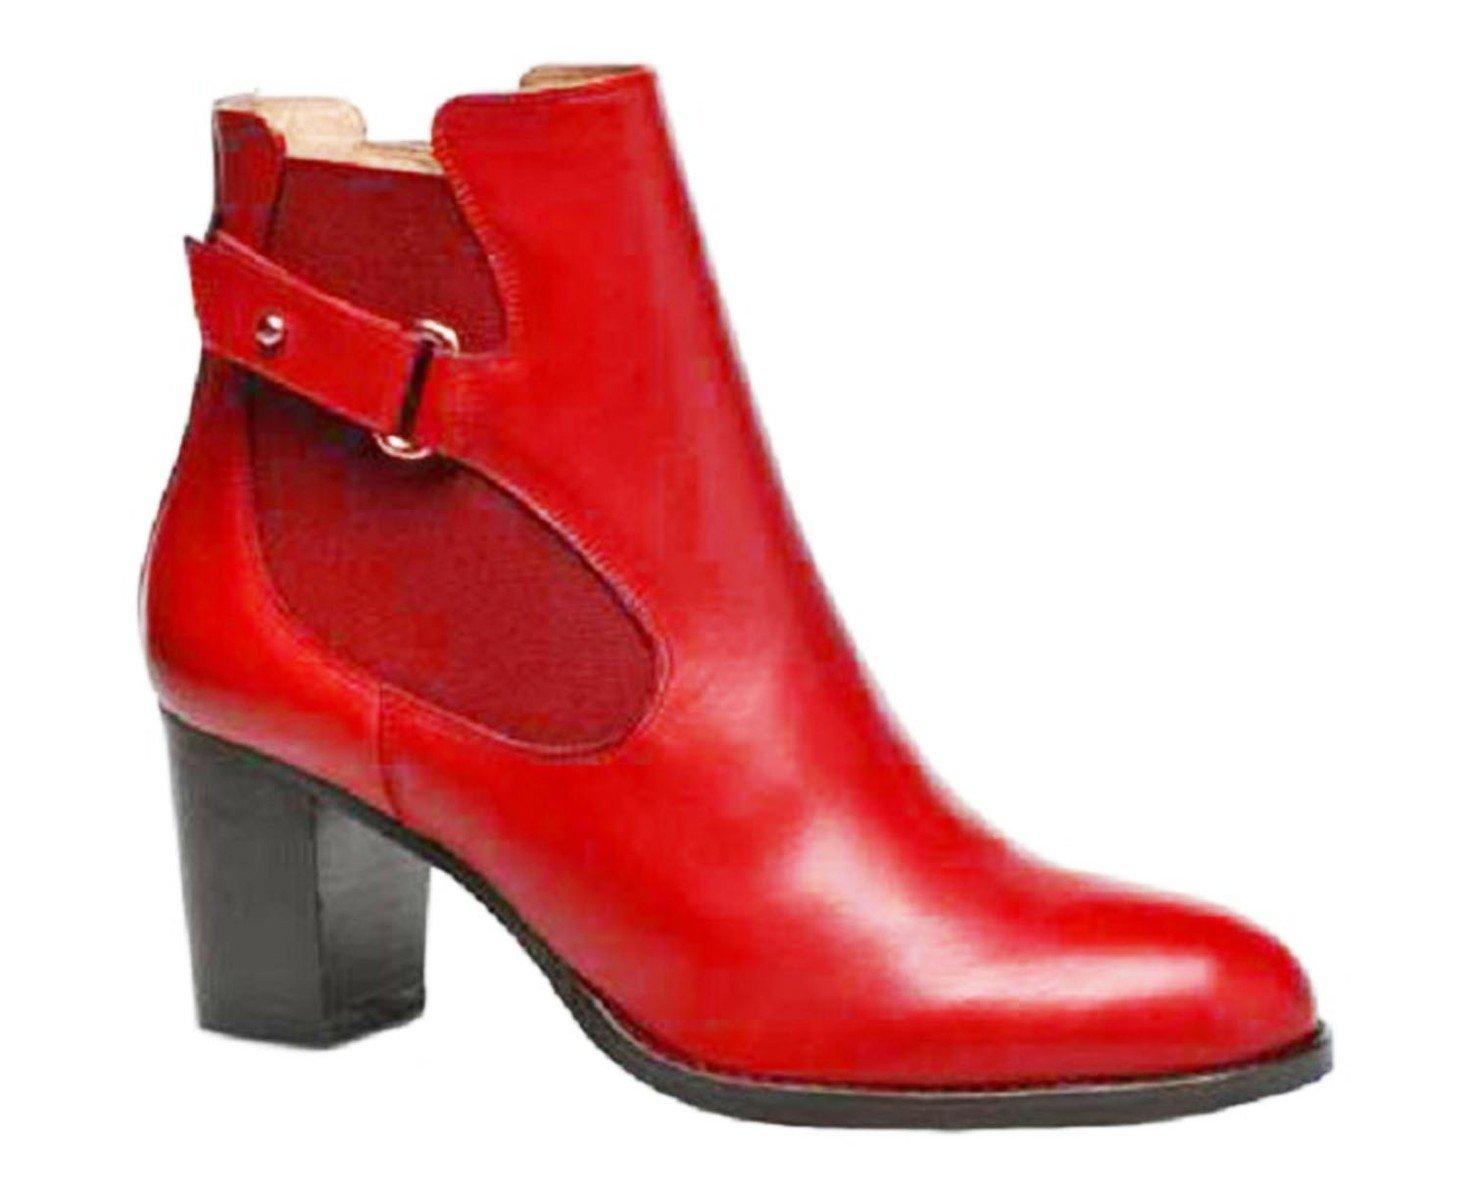 11sunshop - Botas de Otra Piel para mujer33 EU|Rojo